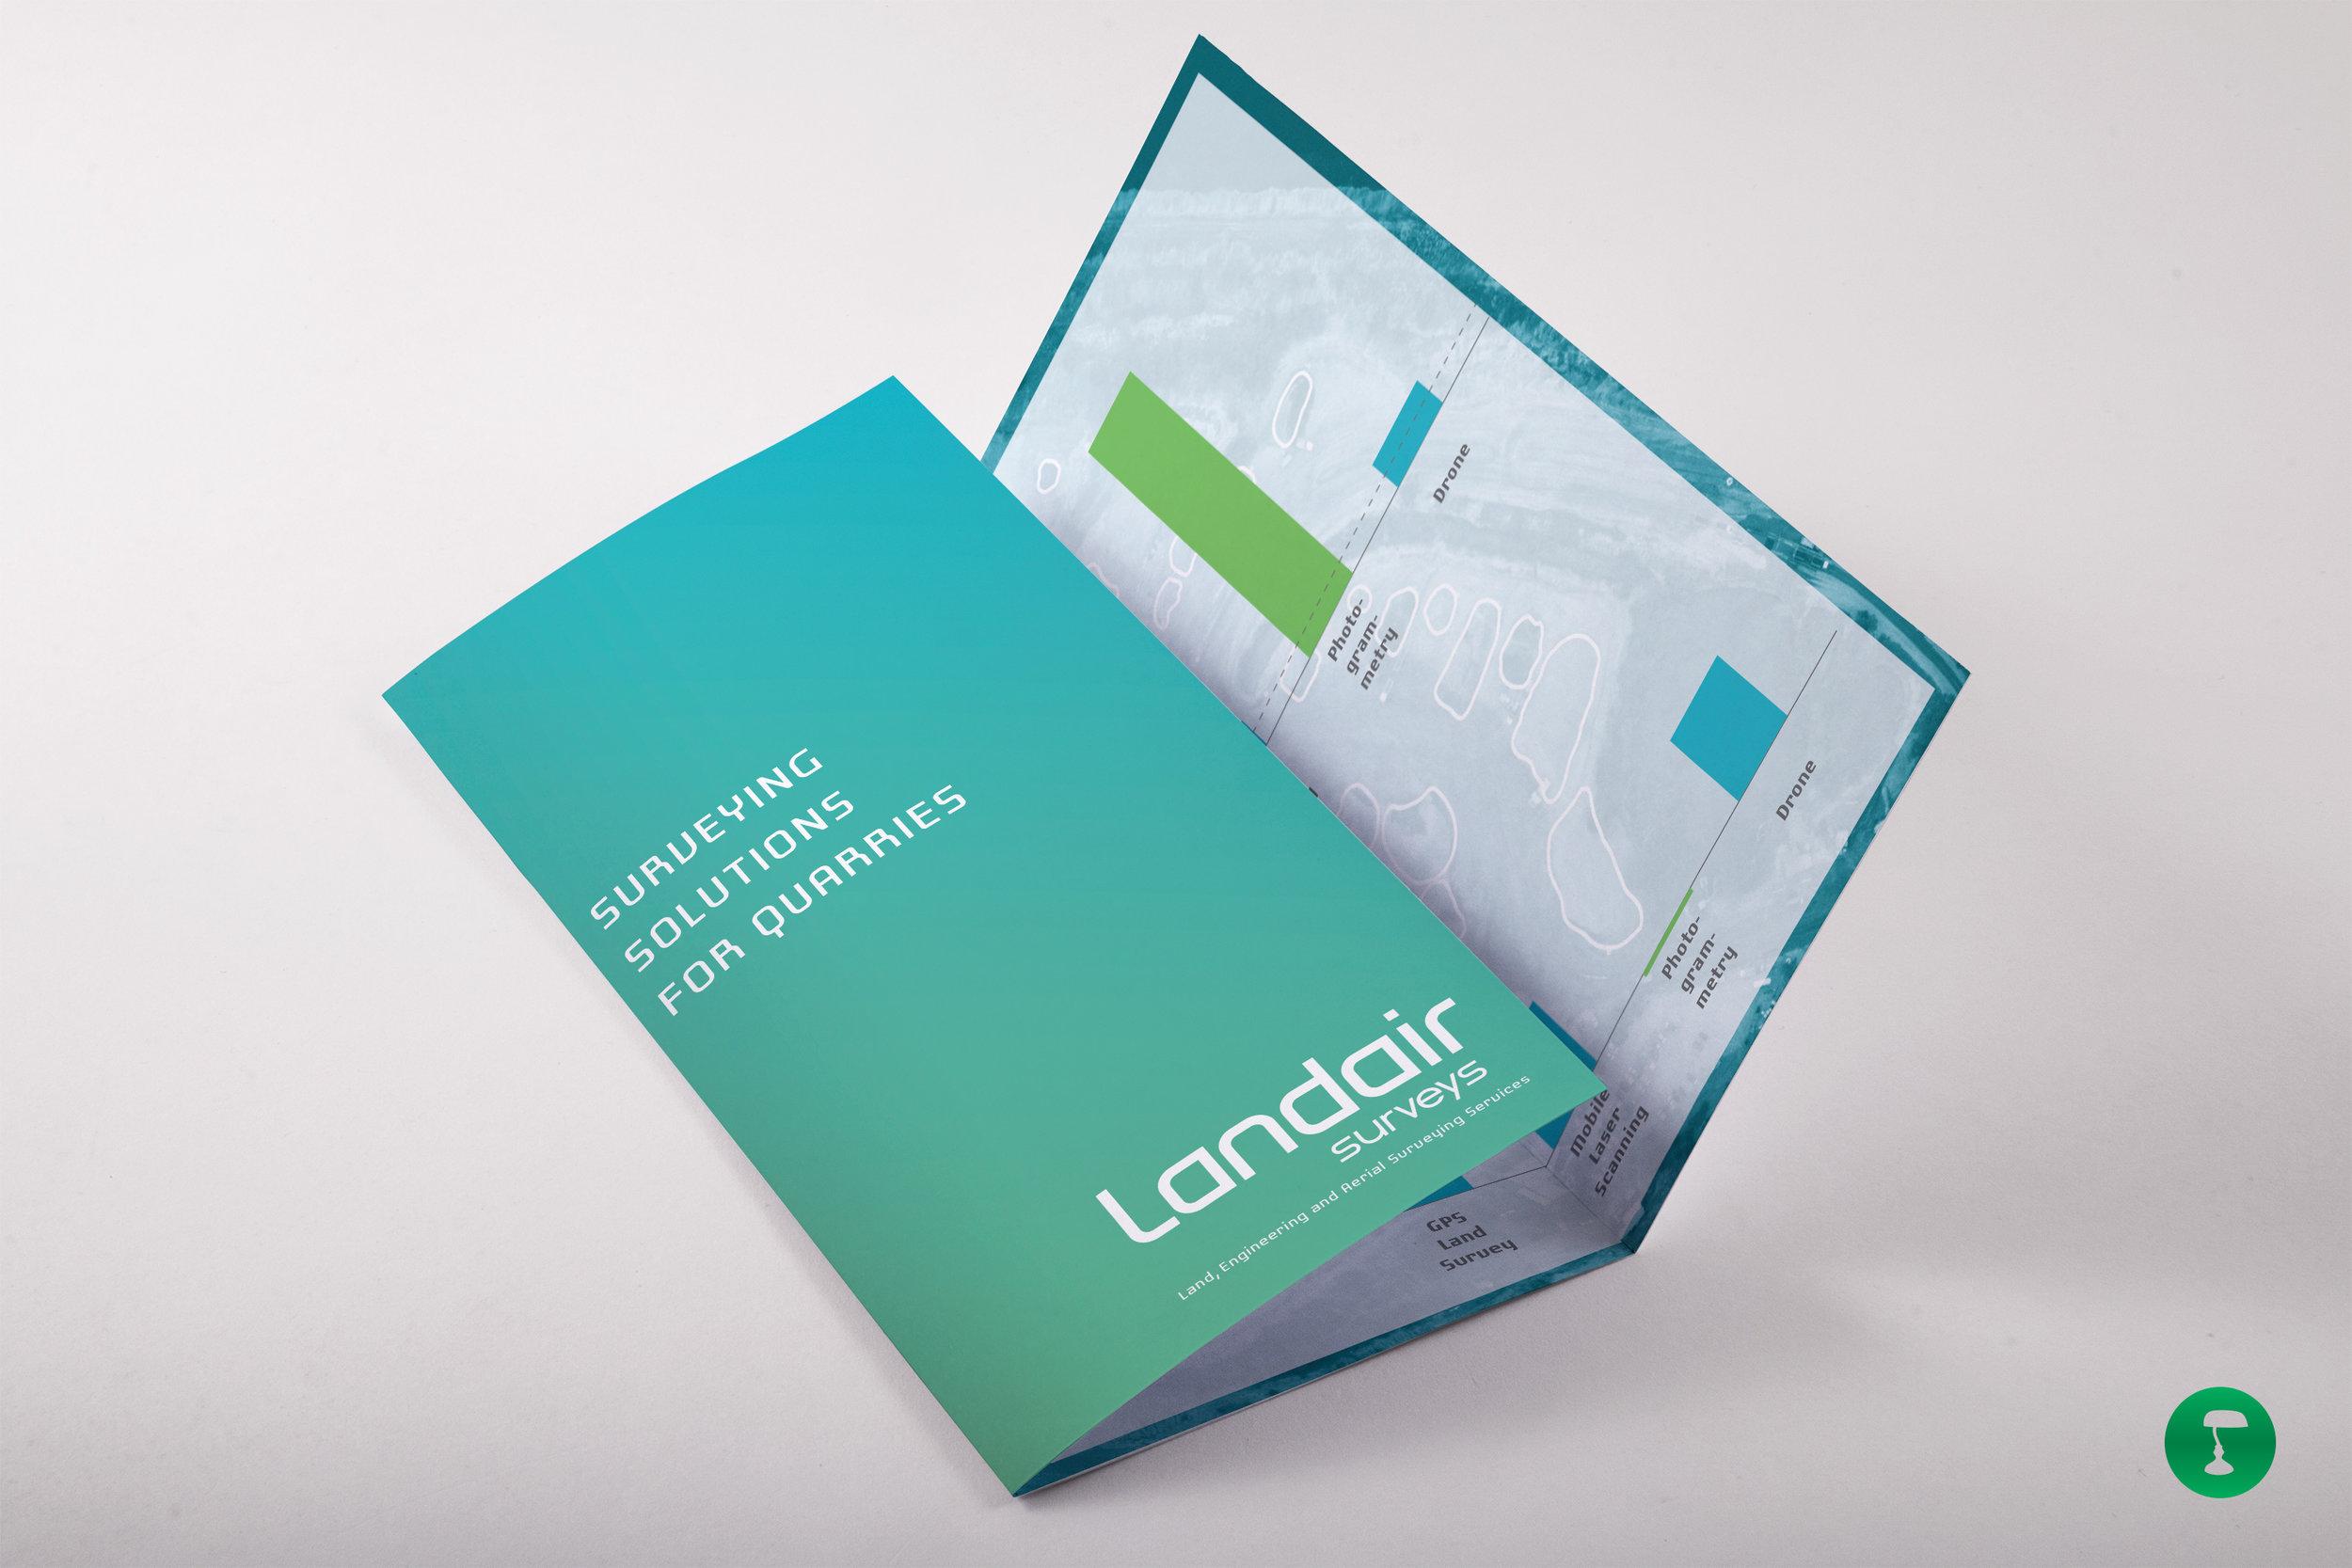 landair_surveys_-_quarry_-_dl_brochure_-_mockup_-_2.jpg